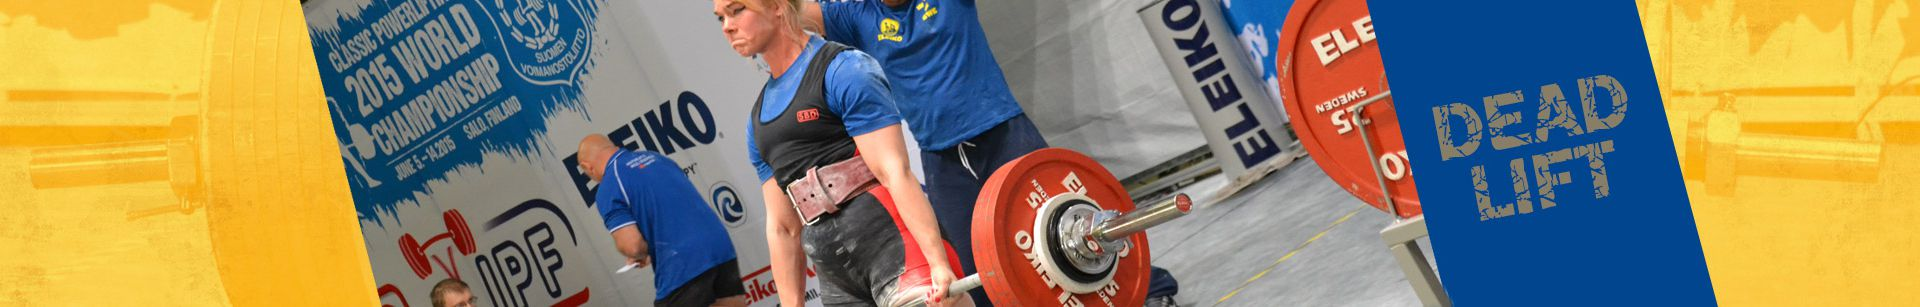 EPF - European Powerlifting Federation